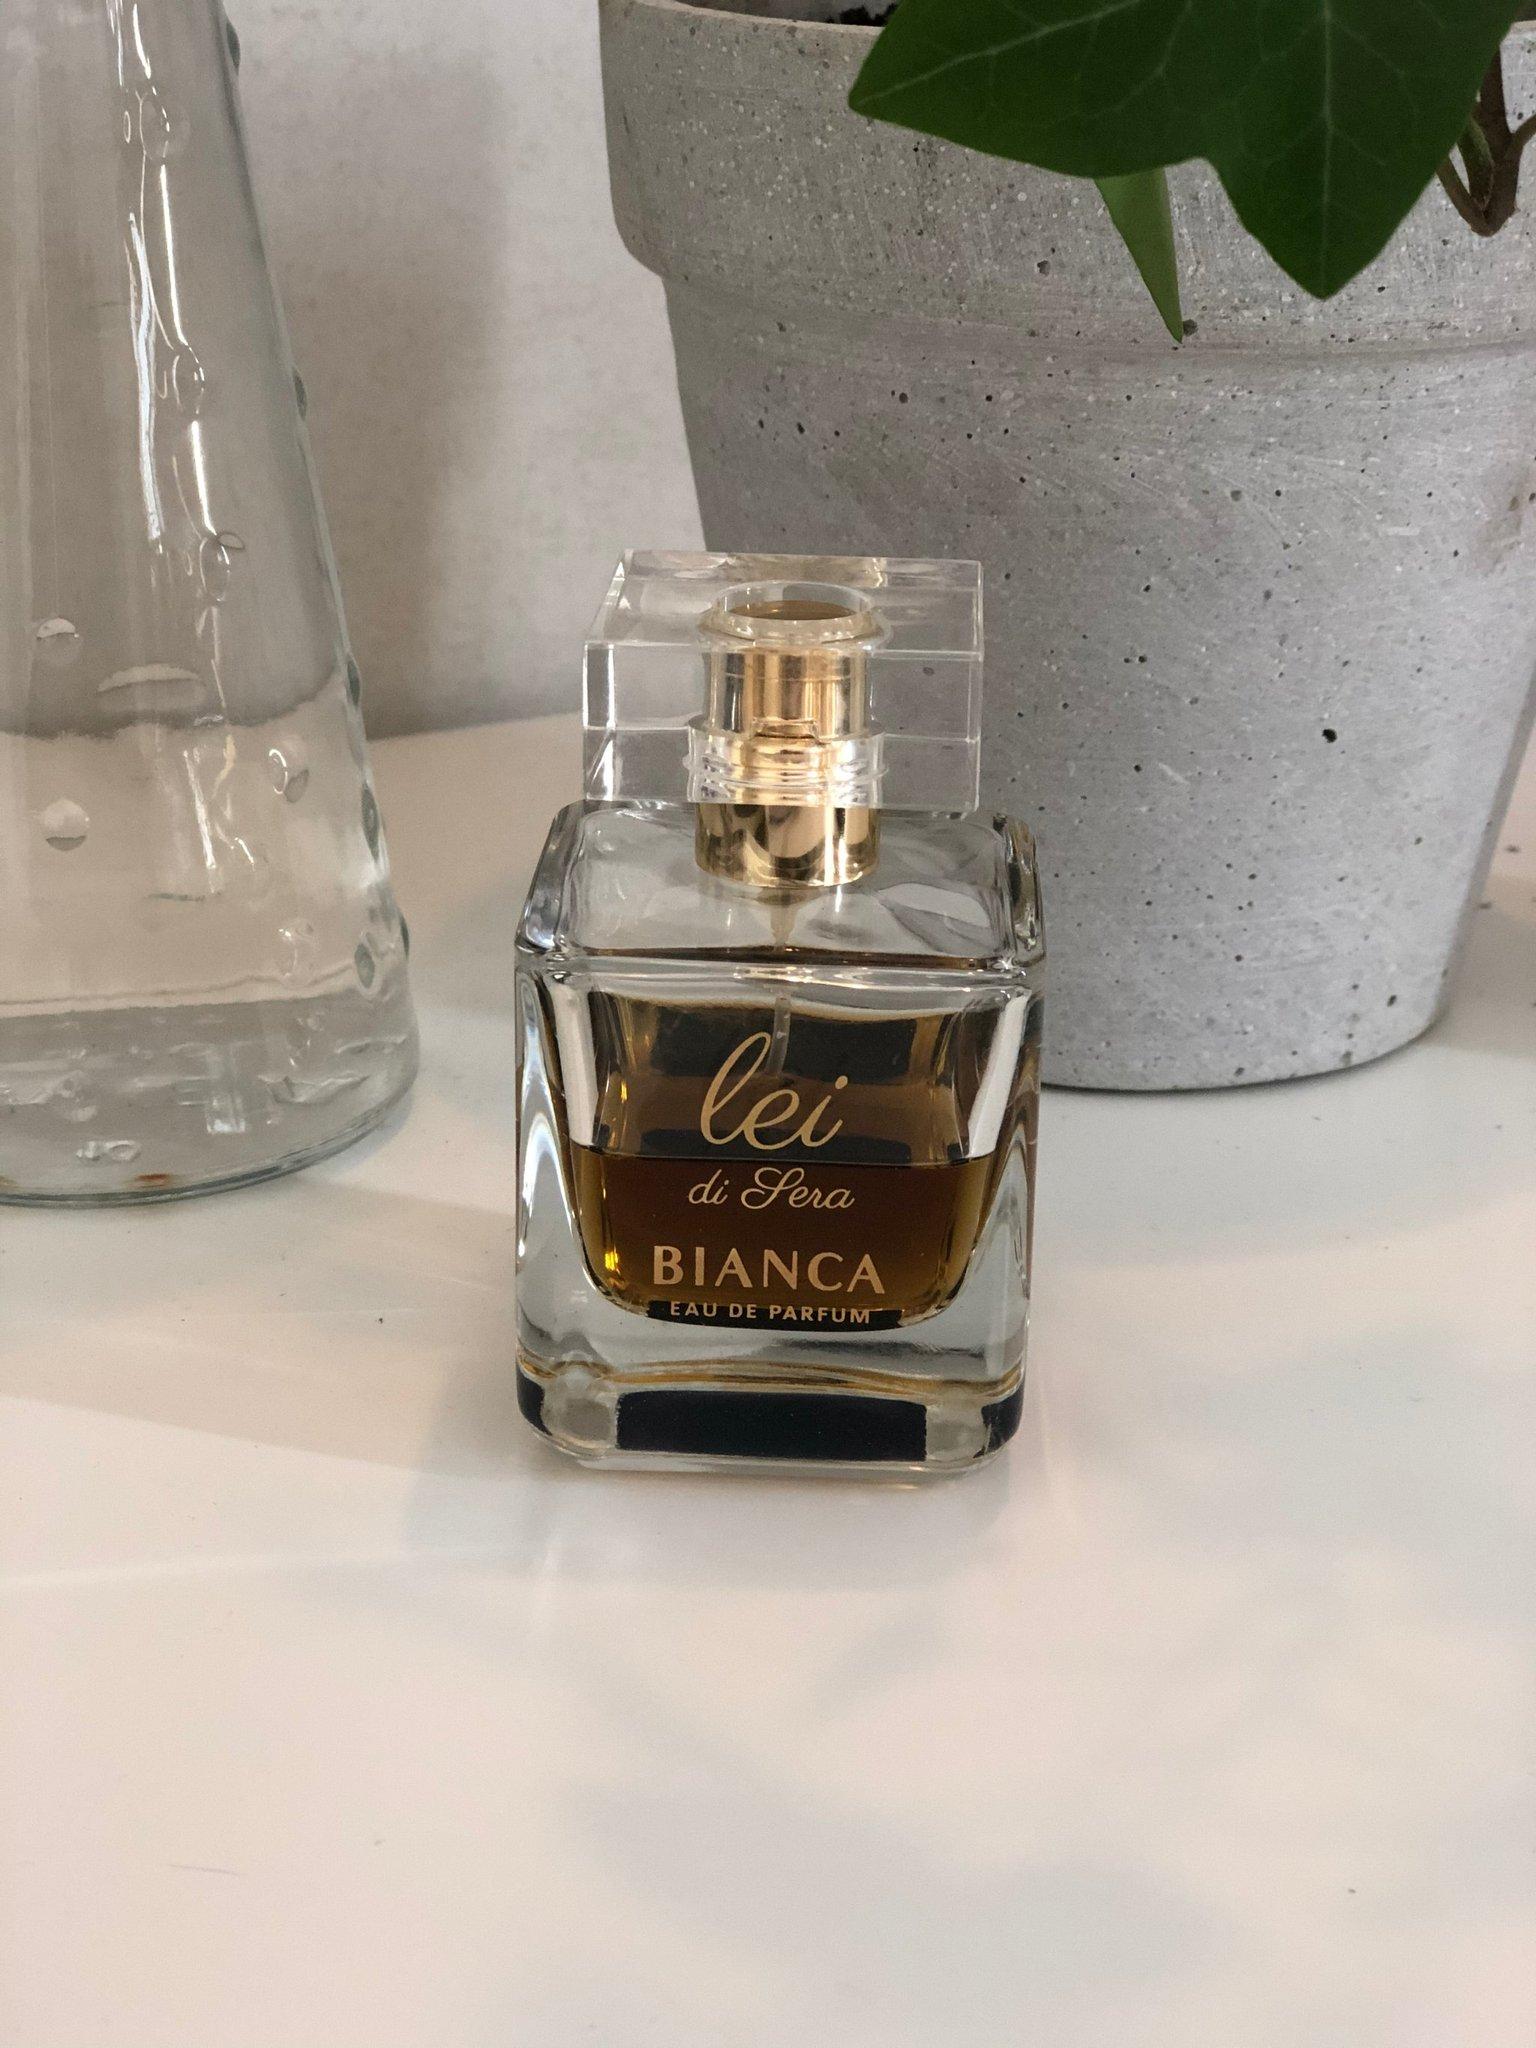 Biancas parfym lei di sera (417528619) ᐈ Köp på Tradera